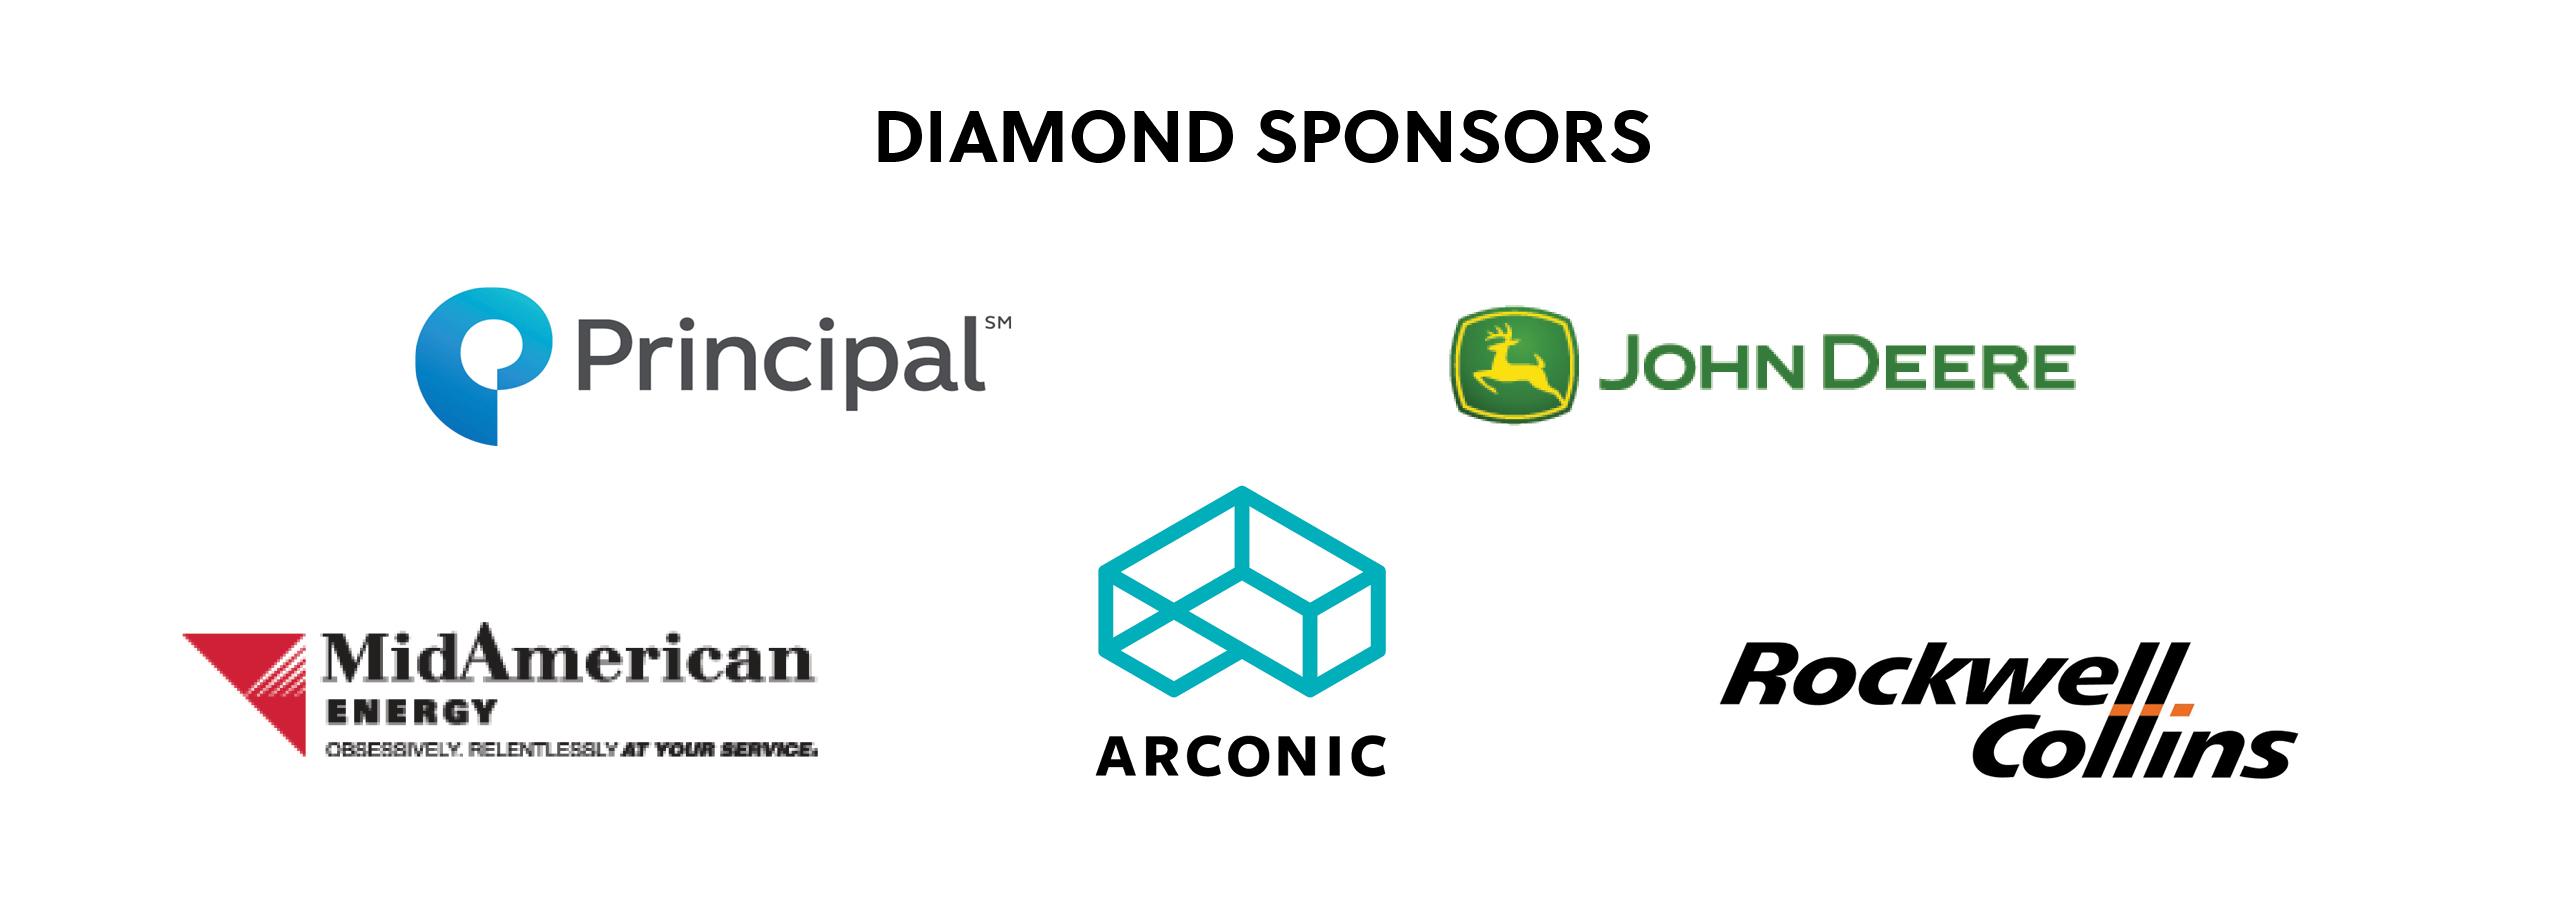 Website - 2018 Diamond Sponsors